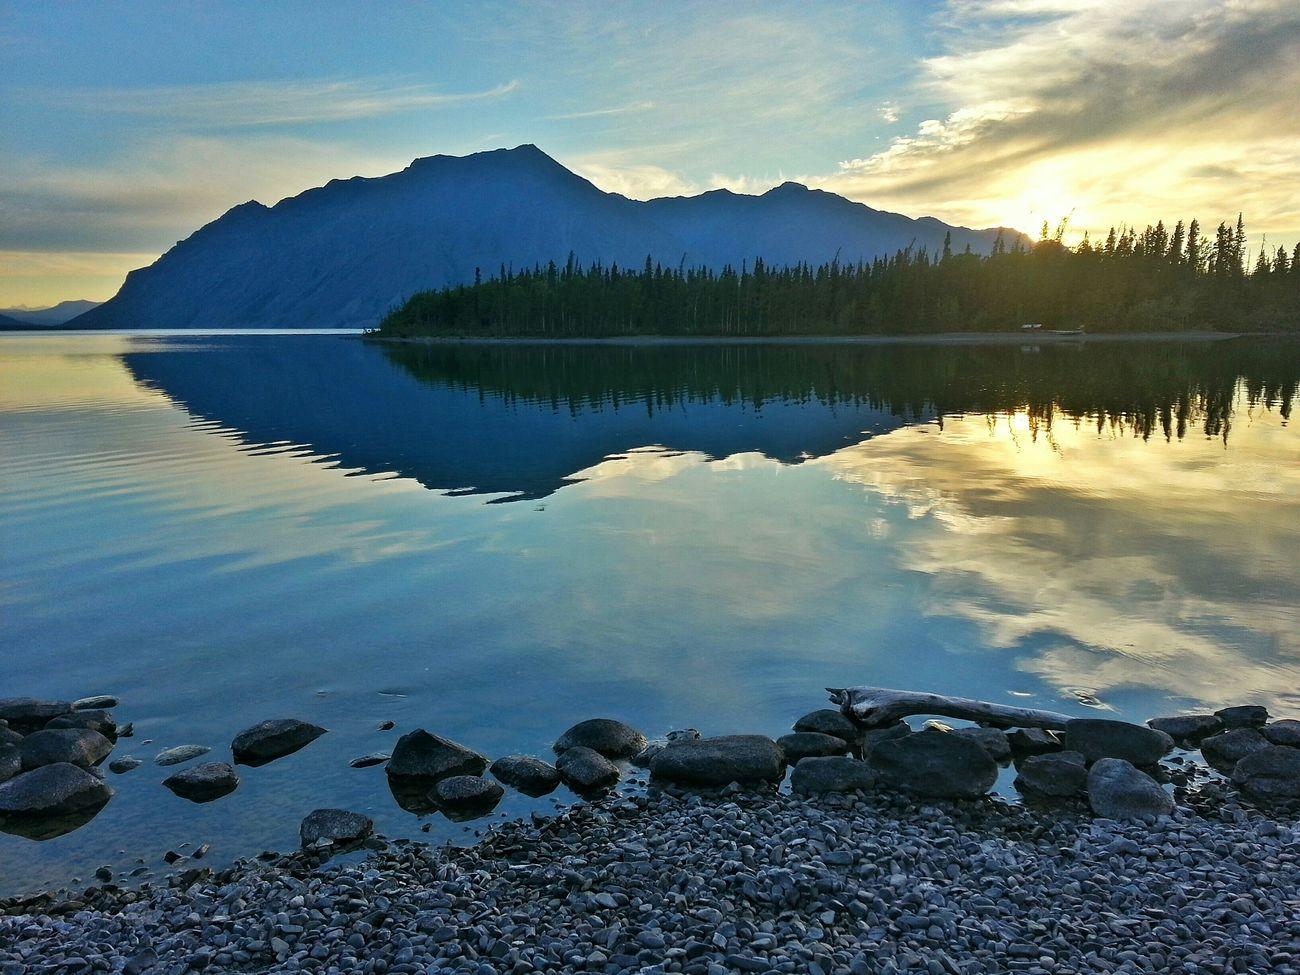 Kathleen lake in kluane national park. Yukon territory Hdr_Collection Canada Coast To Coast Samsung Galaxy S III Vacation Kluane National Park & Reserve Yukon